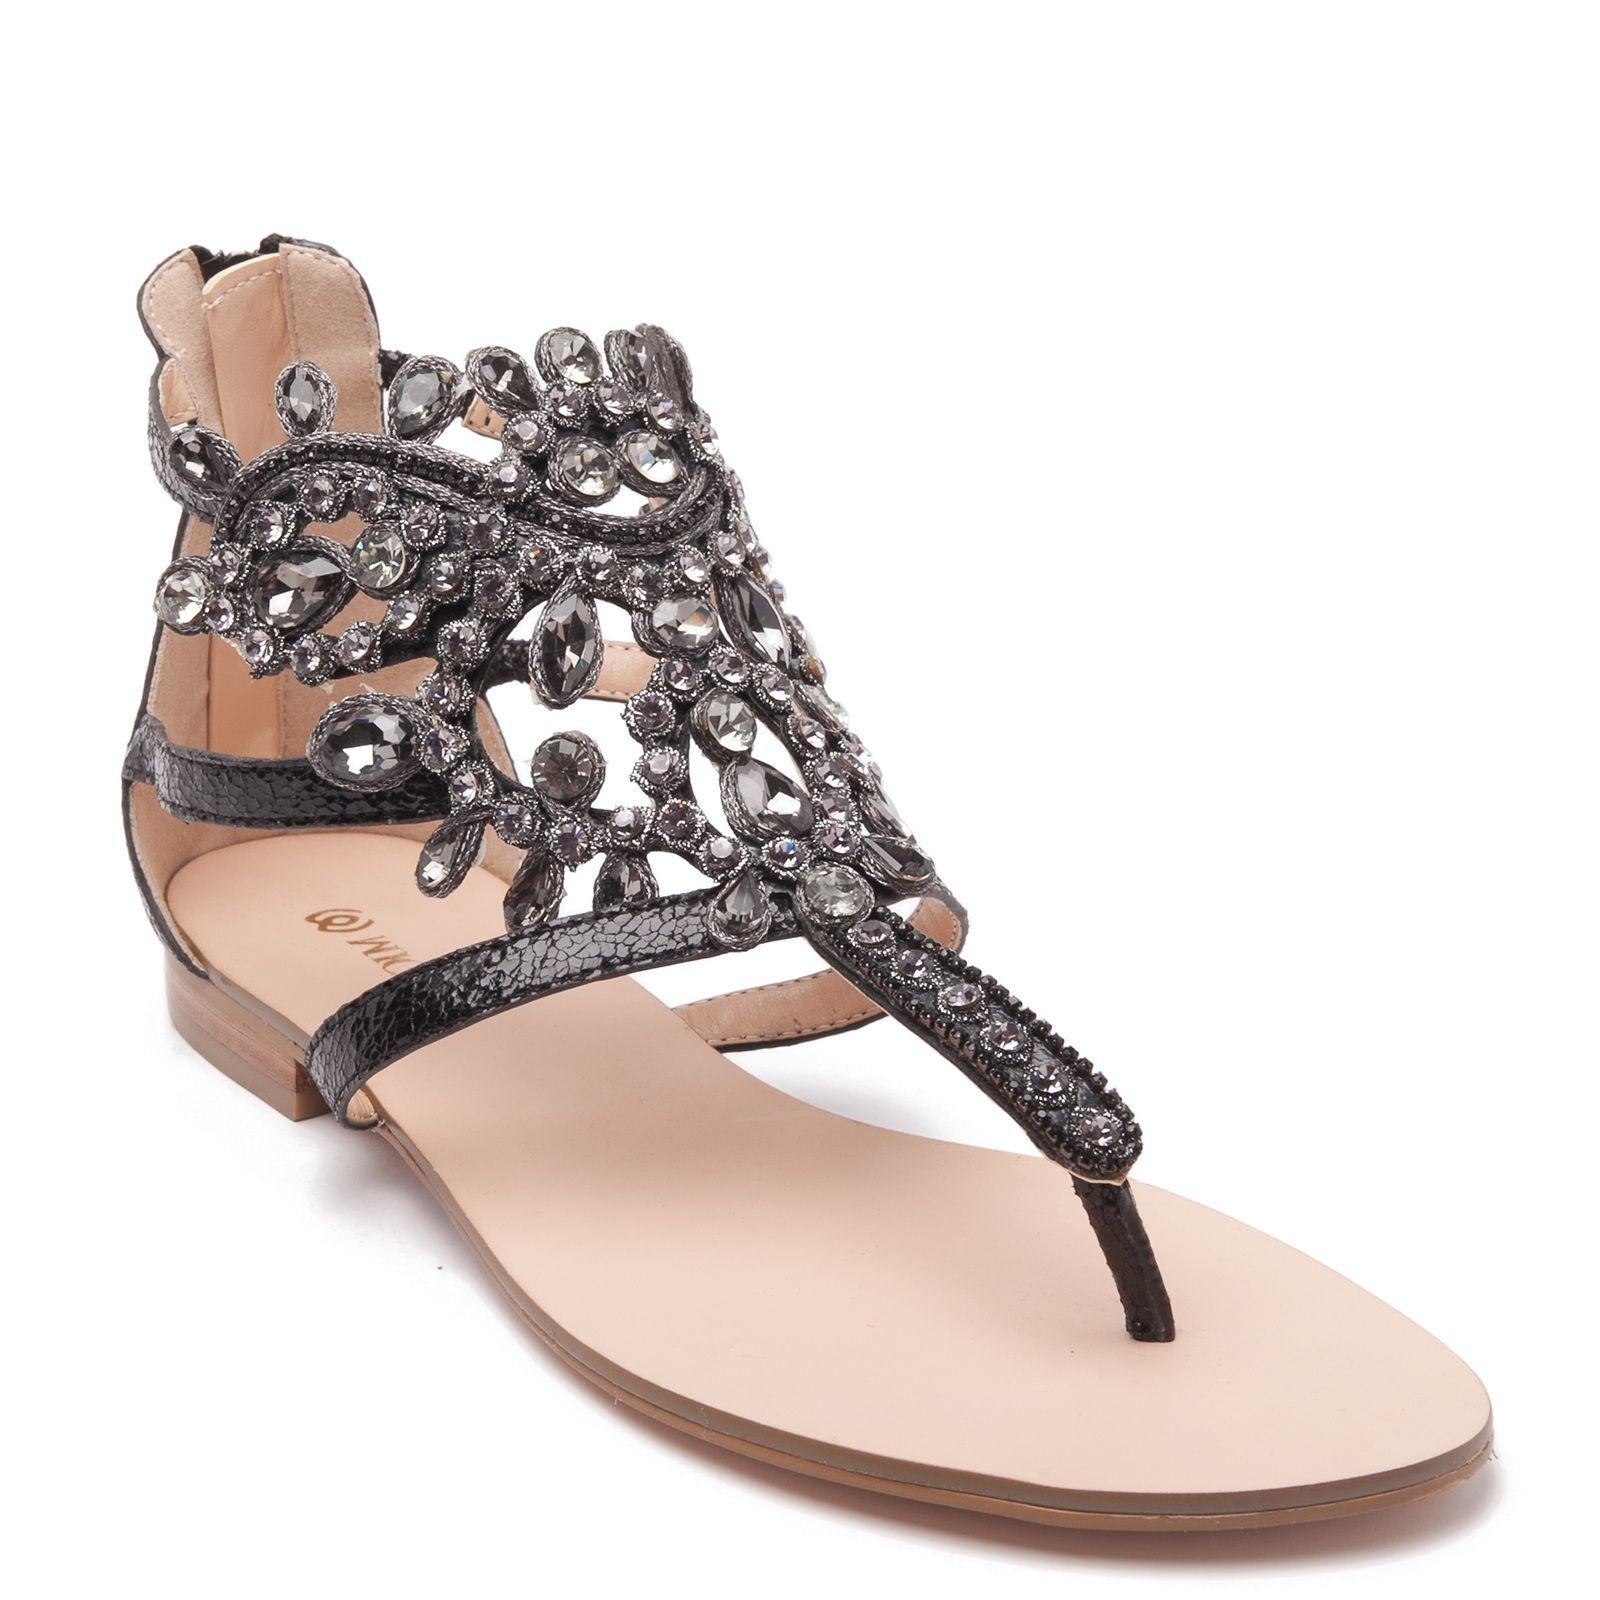 Black sandals rhinestones - Sandal With Black Rhinestones